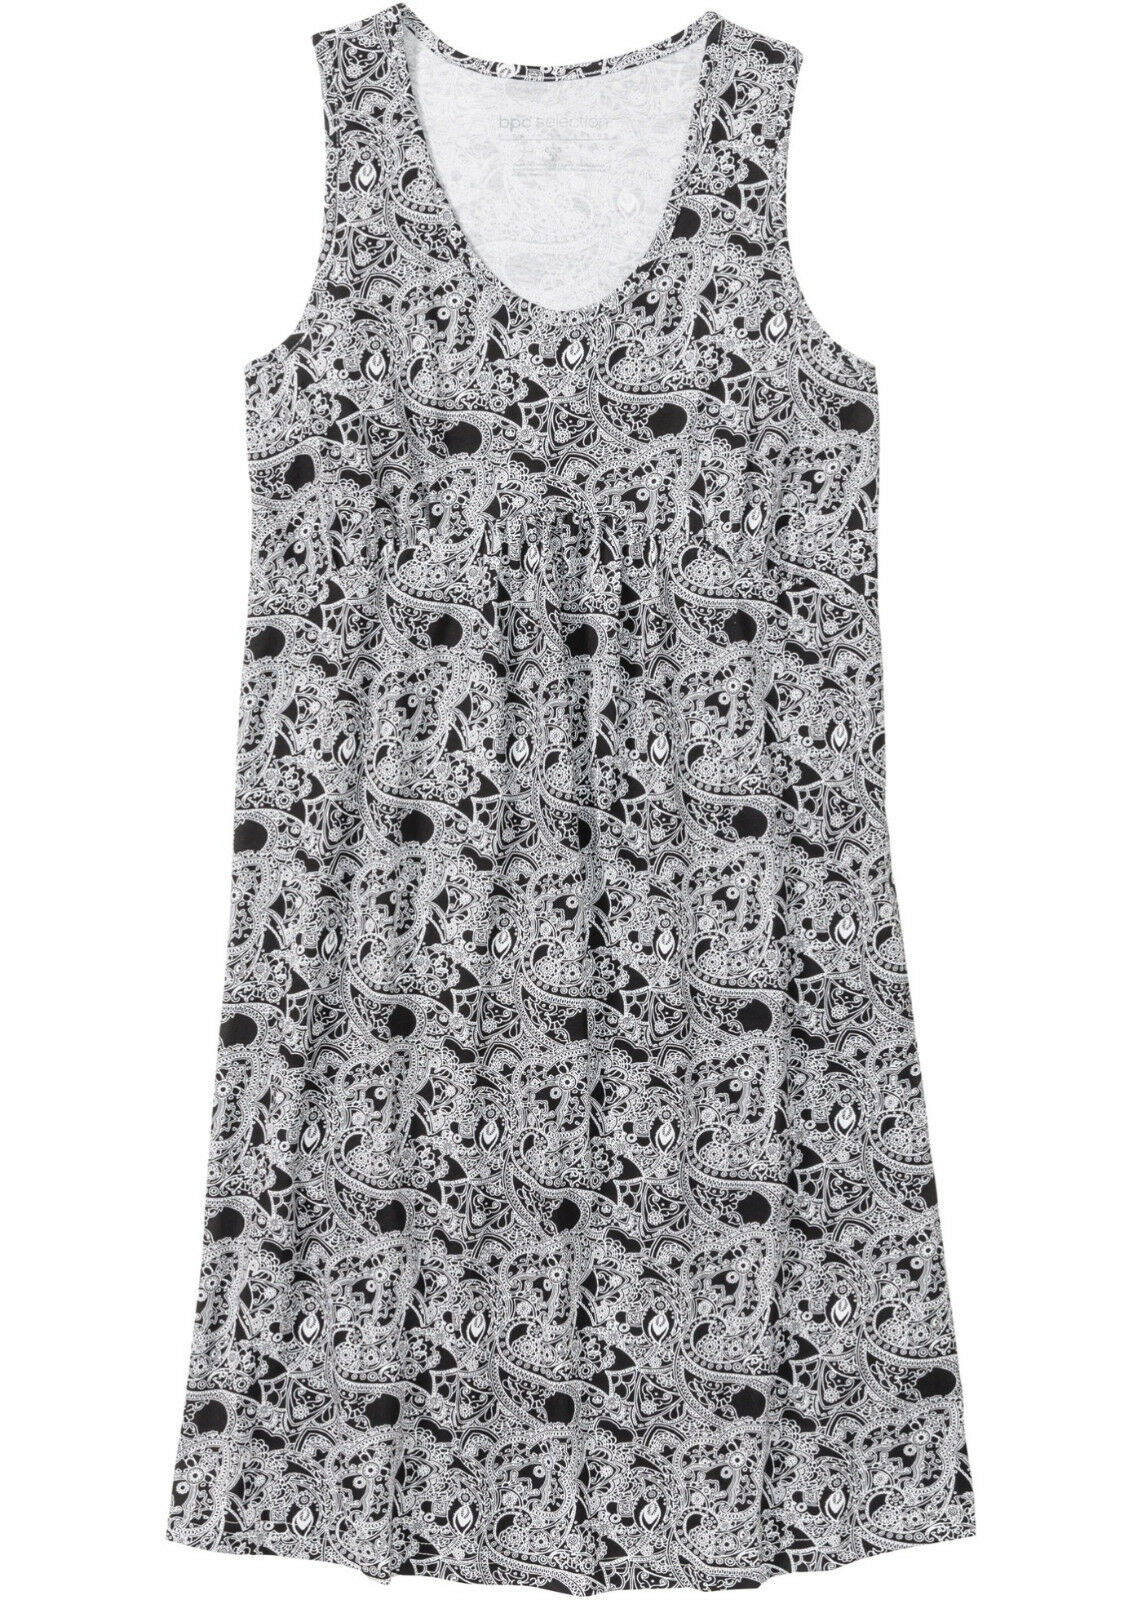 Nachthemd Damen Schlafshirt Bigshirt schwarz gemustert Baumwolle S  L XL neu 323